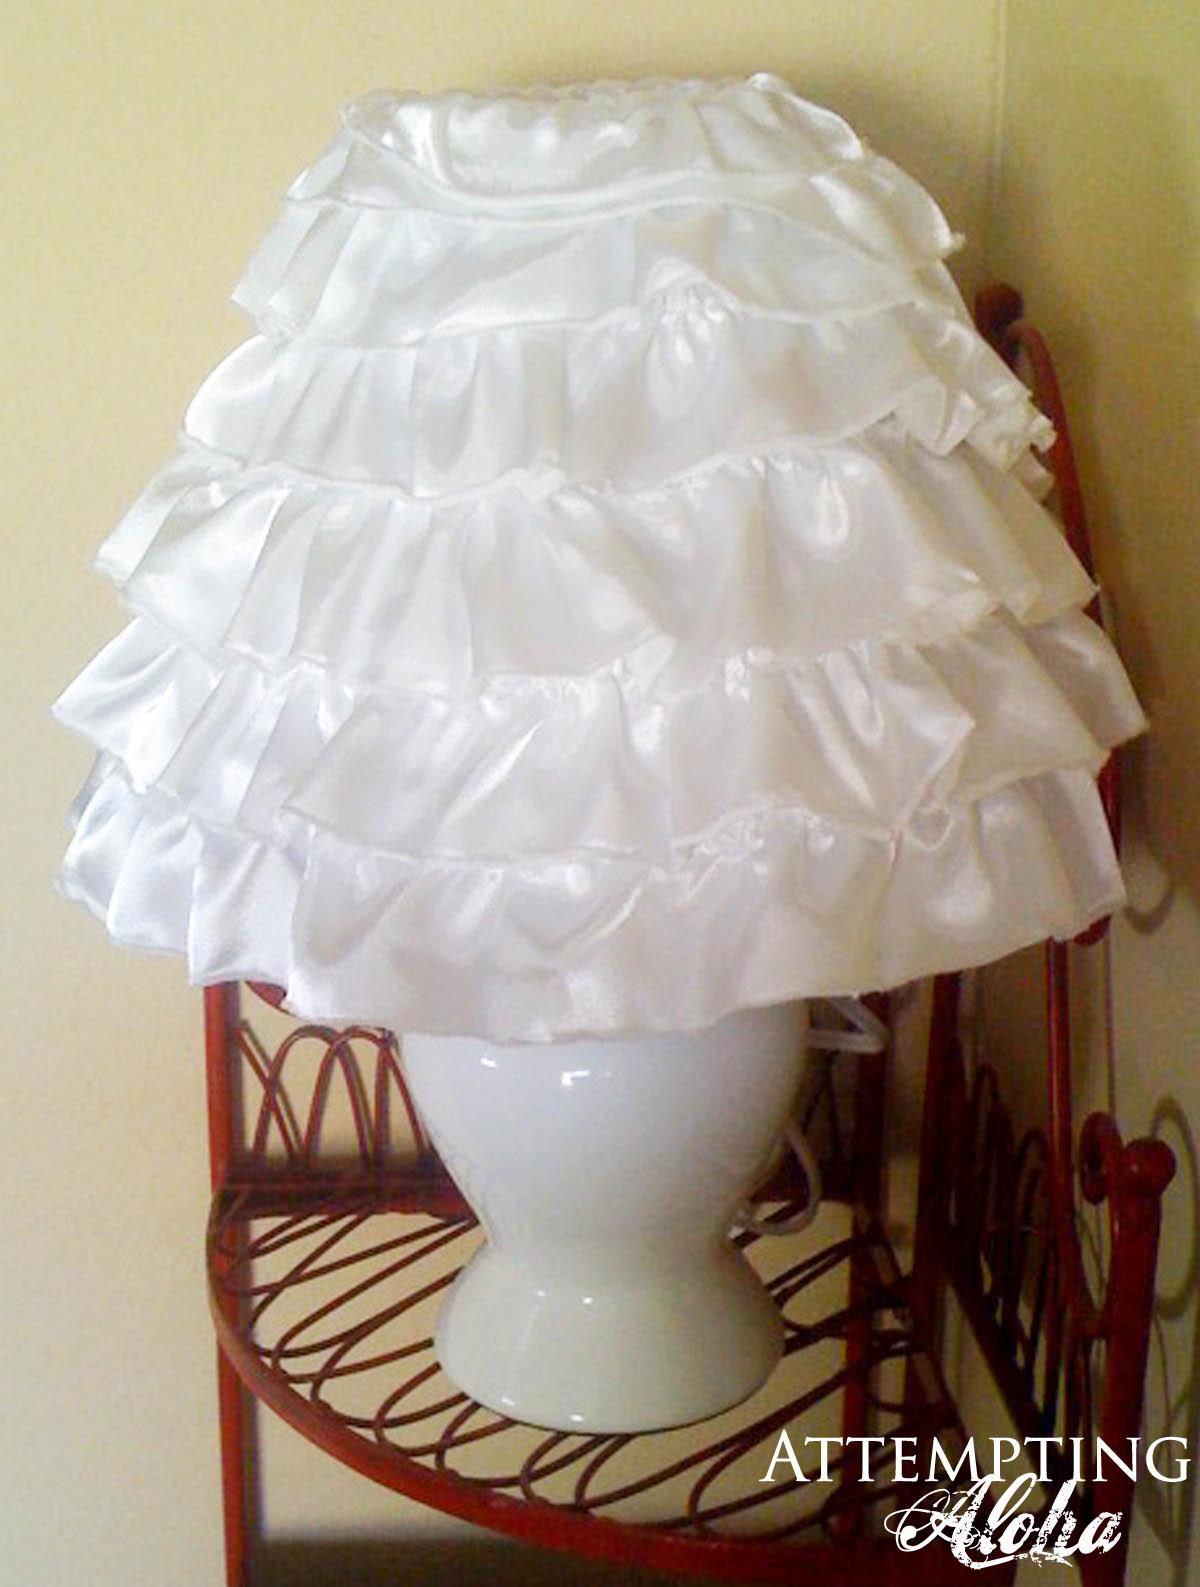 http://3.bp.blogspot.com/_7GDWF1D9h2o/TSWS8wWtaEI/AAAAAAAAAXM/Q7mhf_HxlUQ/s1600/Ruffle+Lamp+Aloha+A.jpg